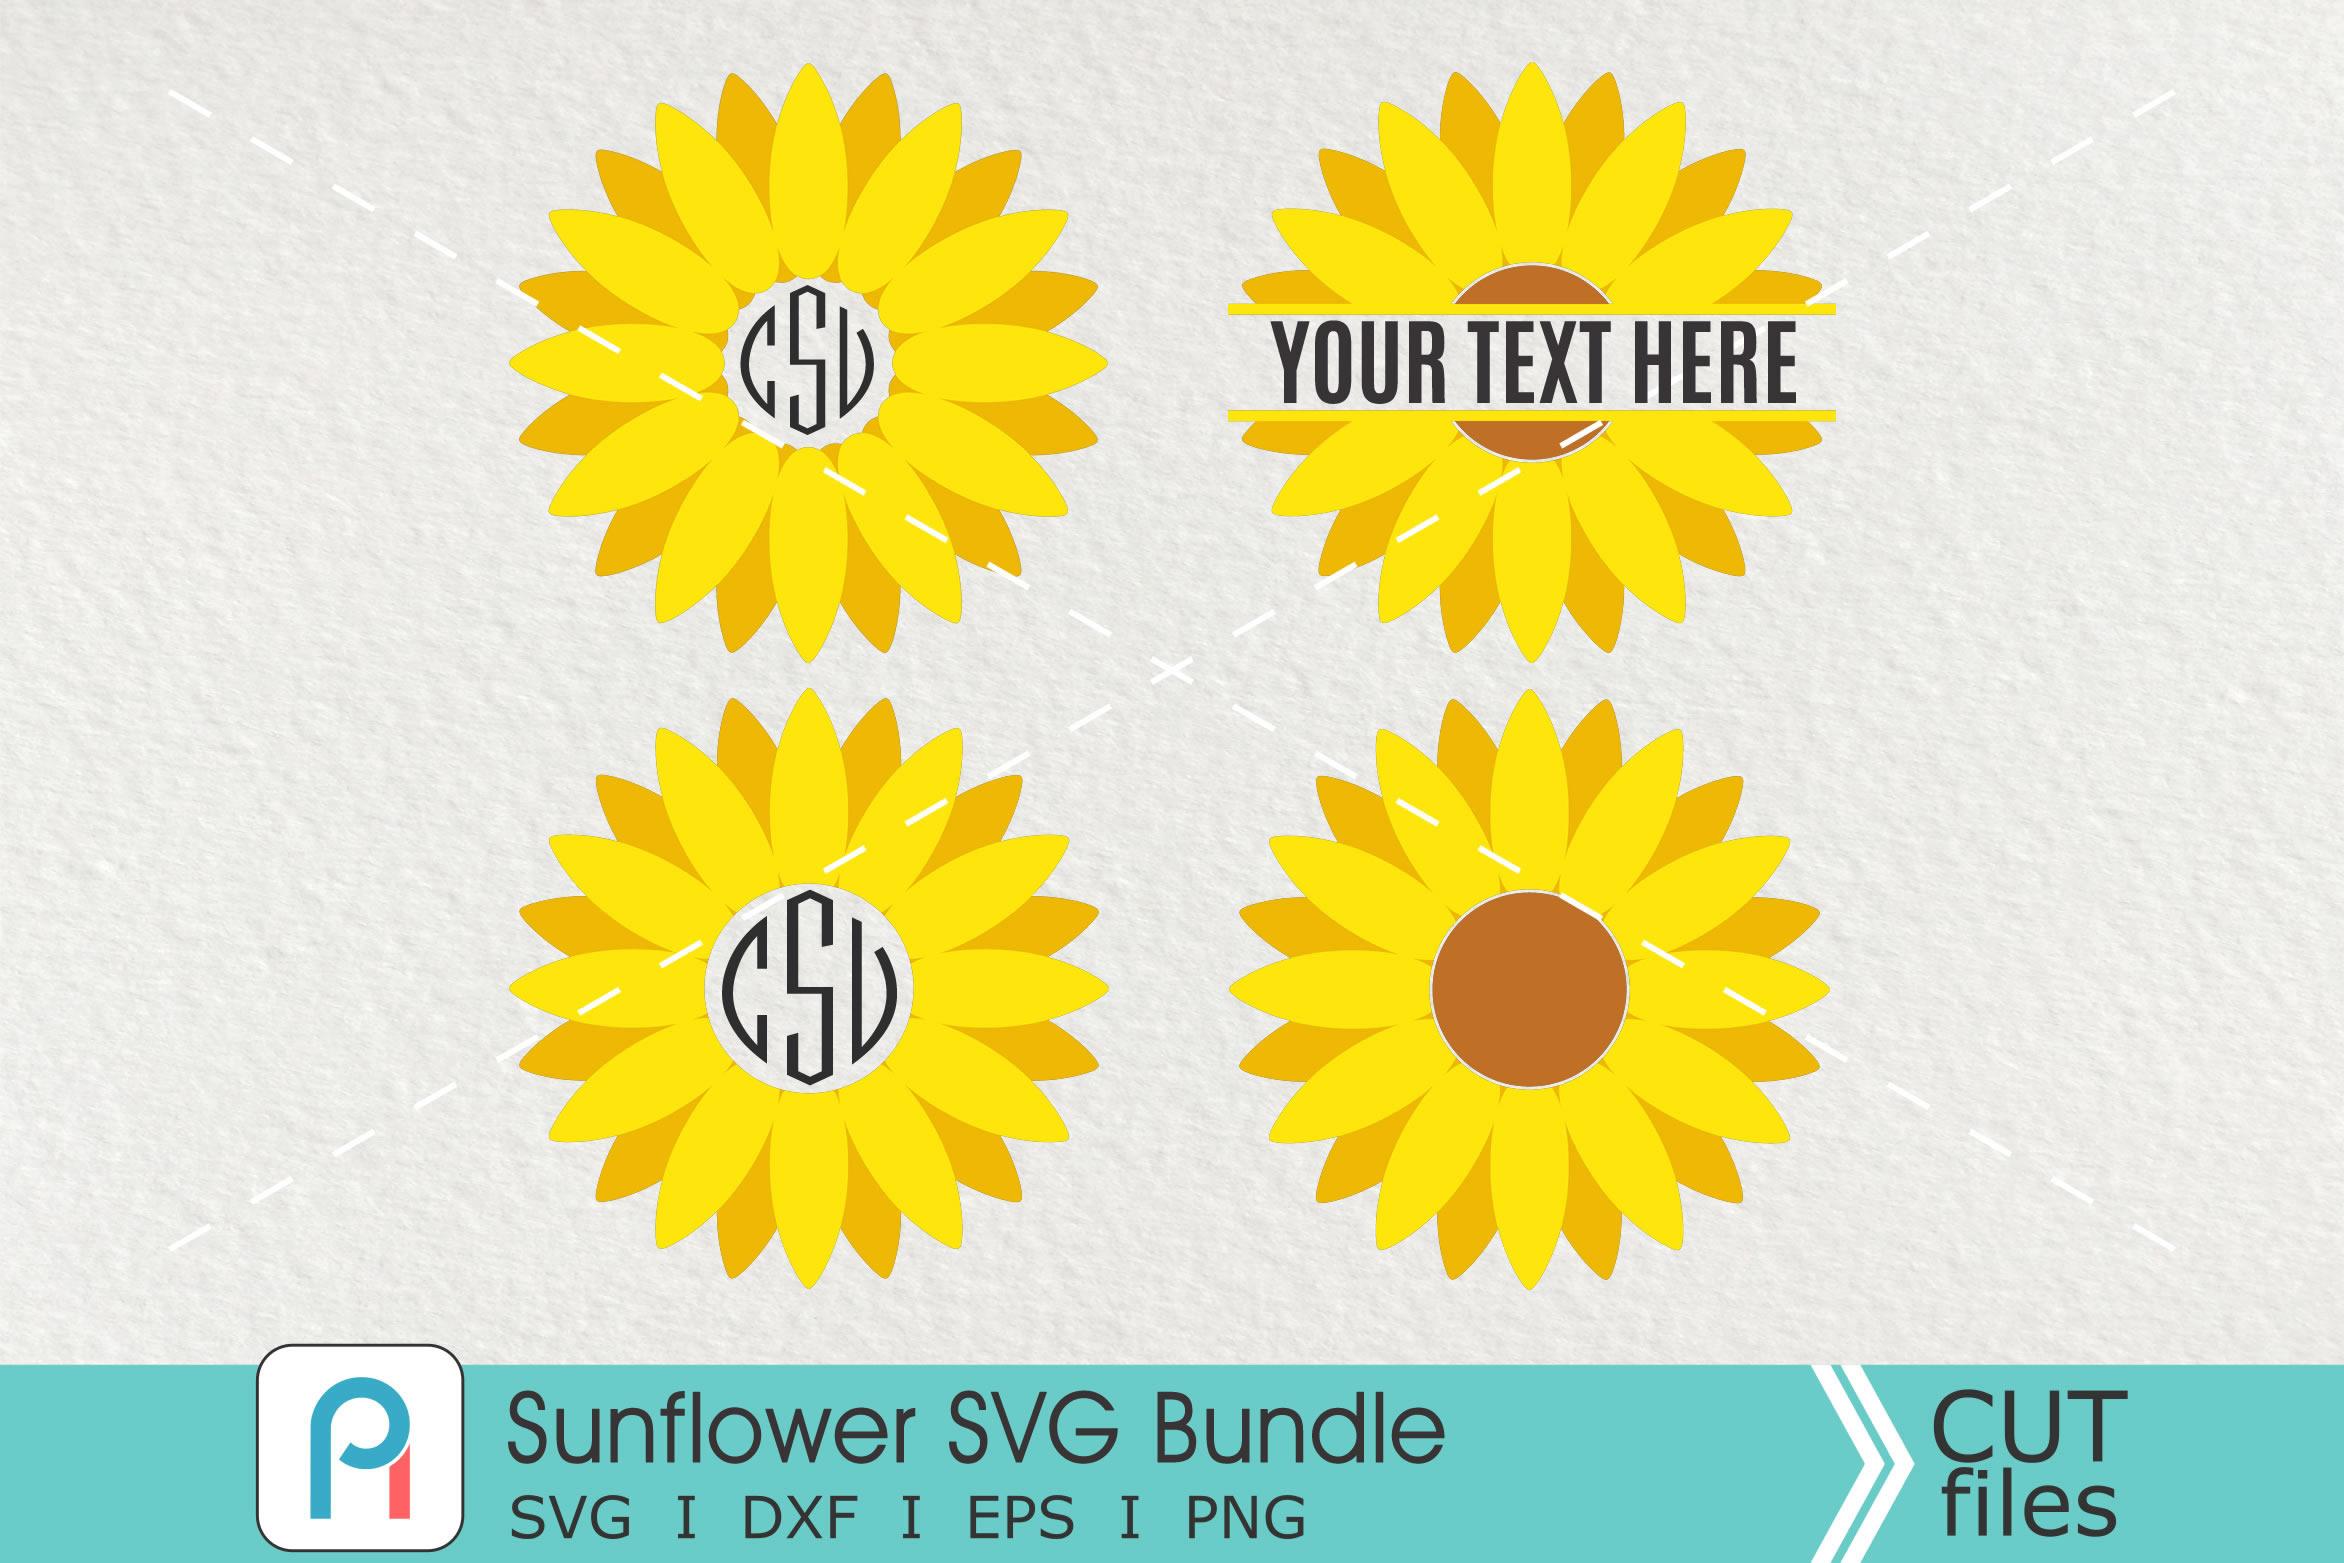 Sunflower Monogram Svg, Sunflower Svg, Sunflower Clipart.